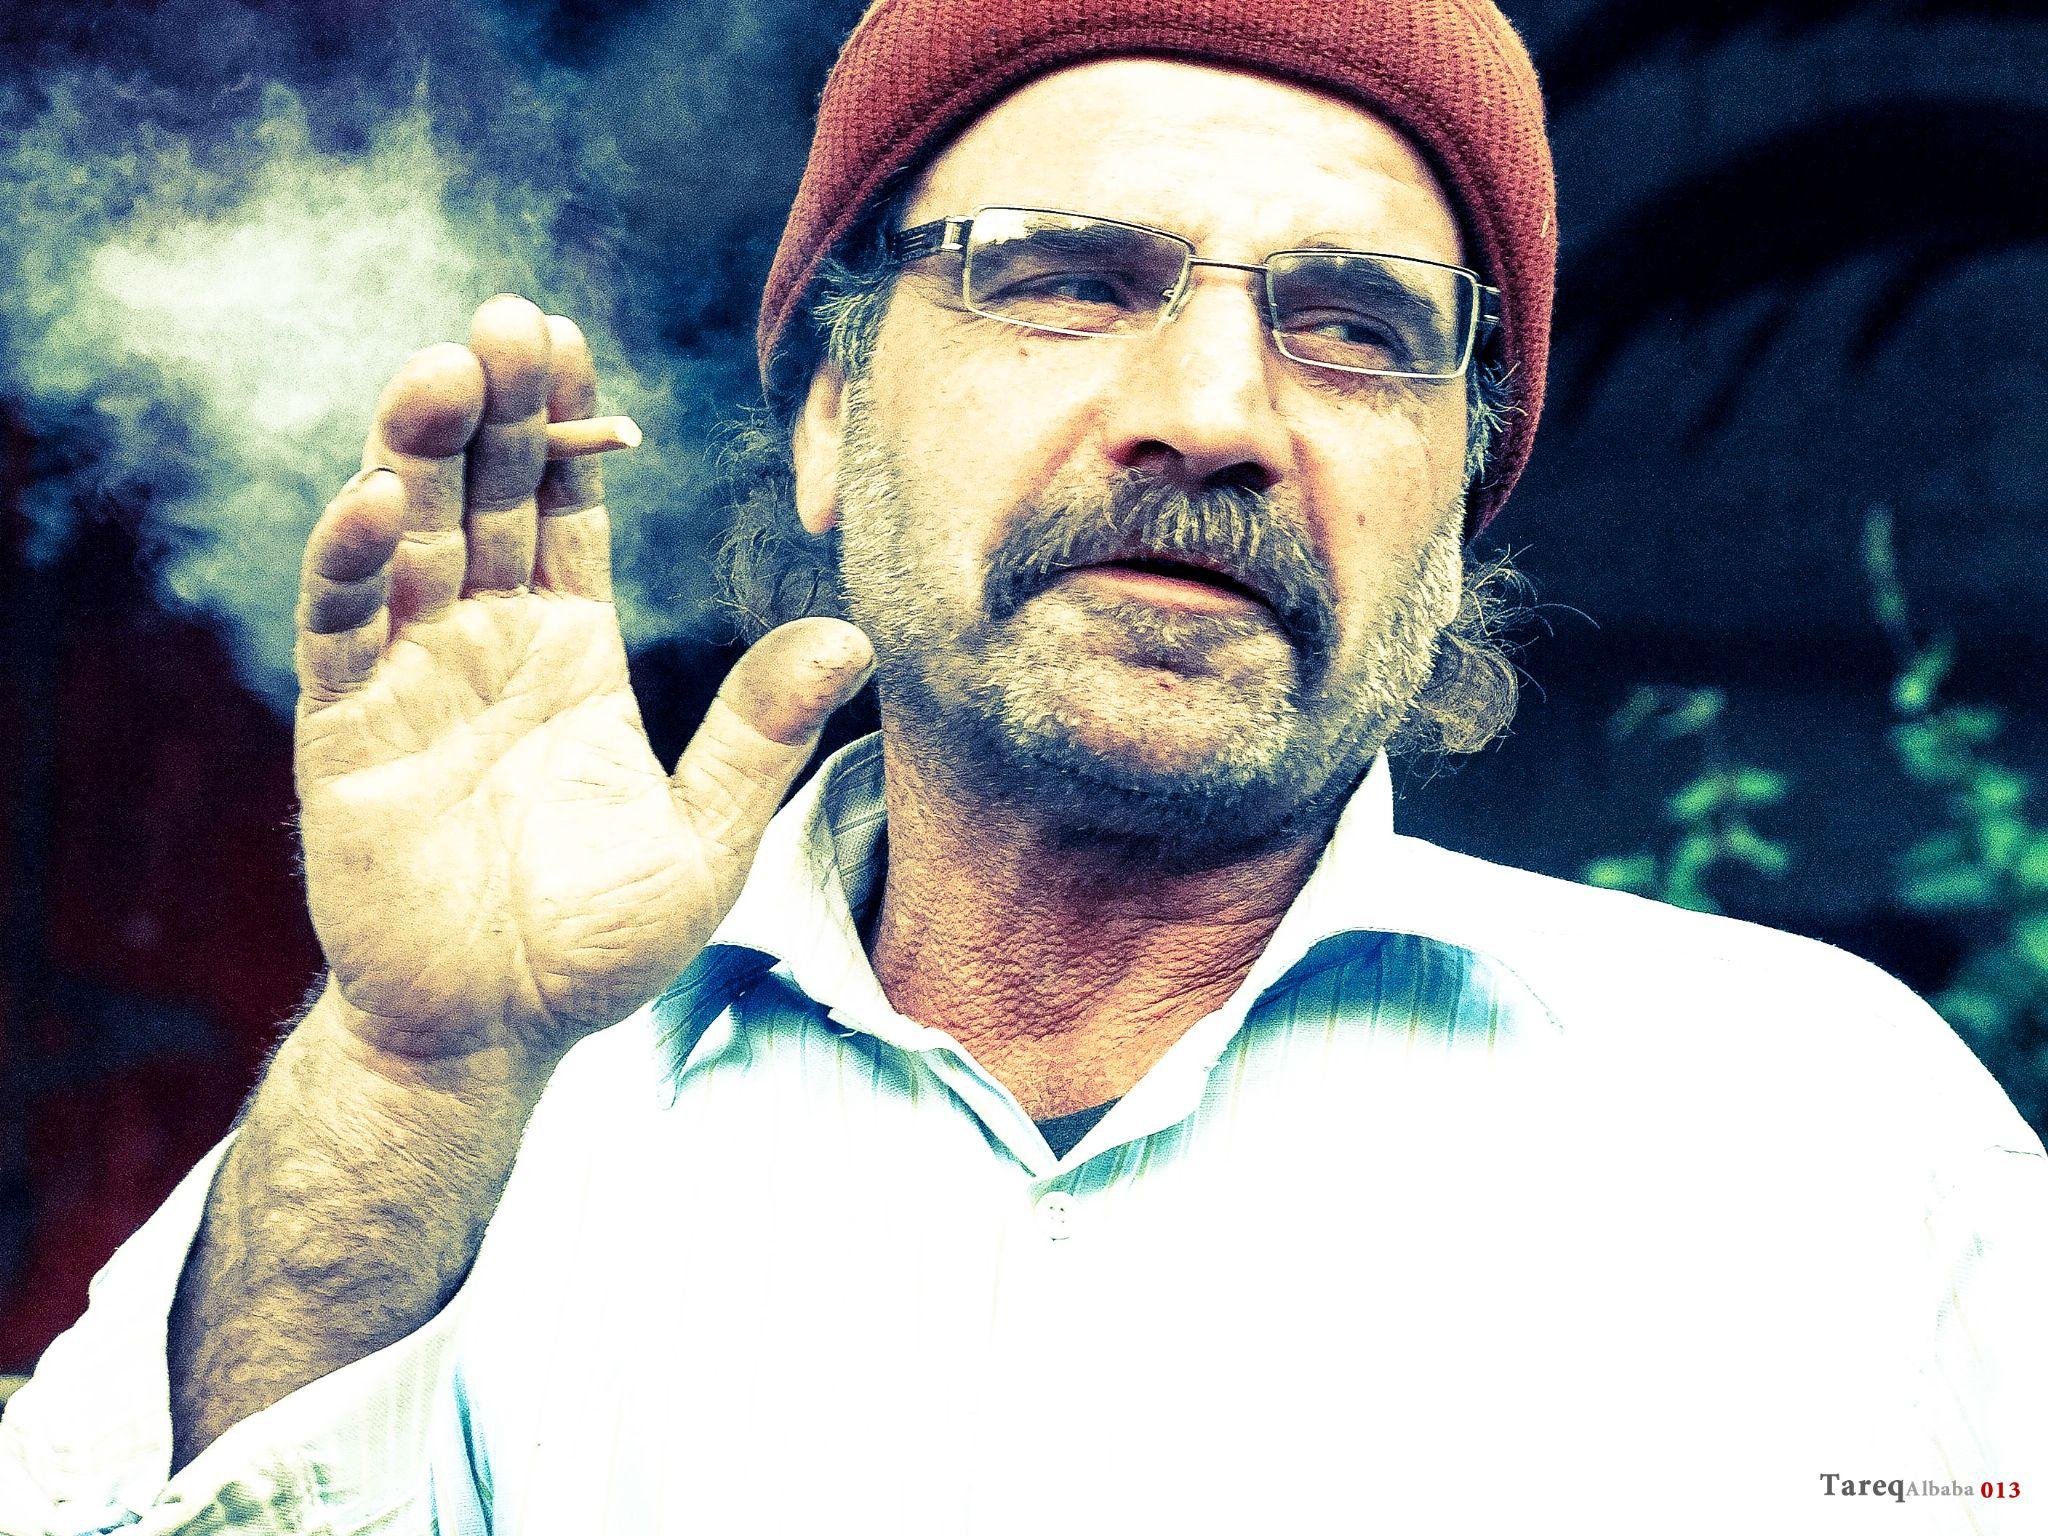 biography by Tareq Albaba